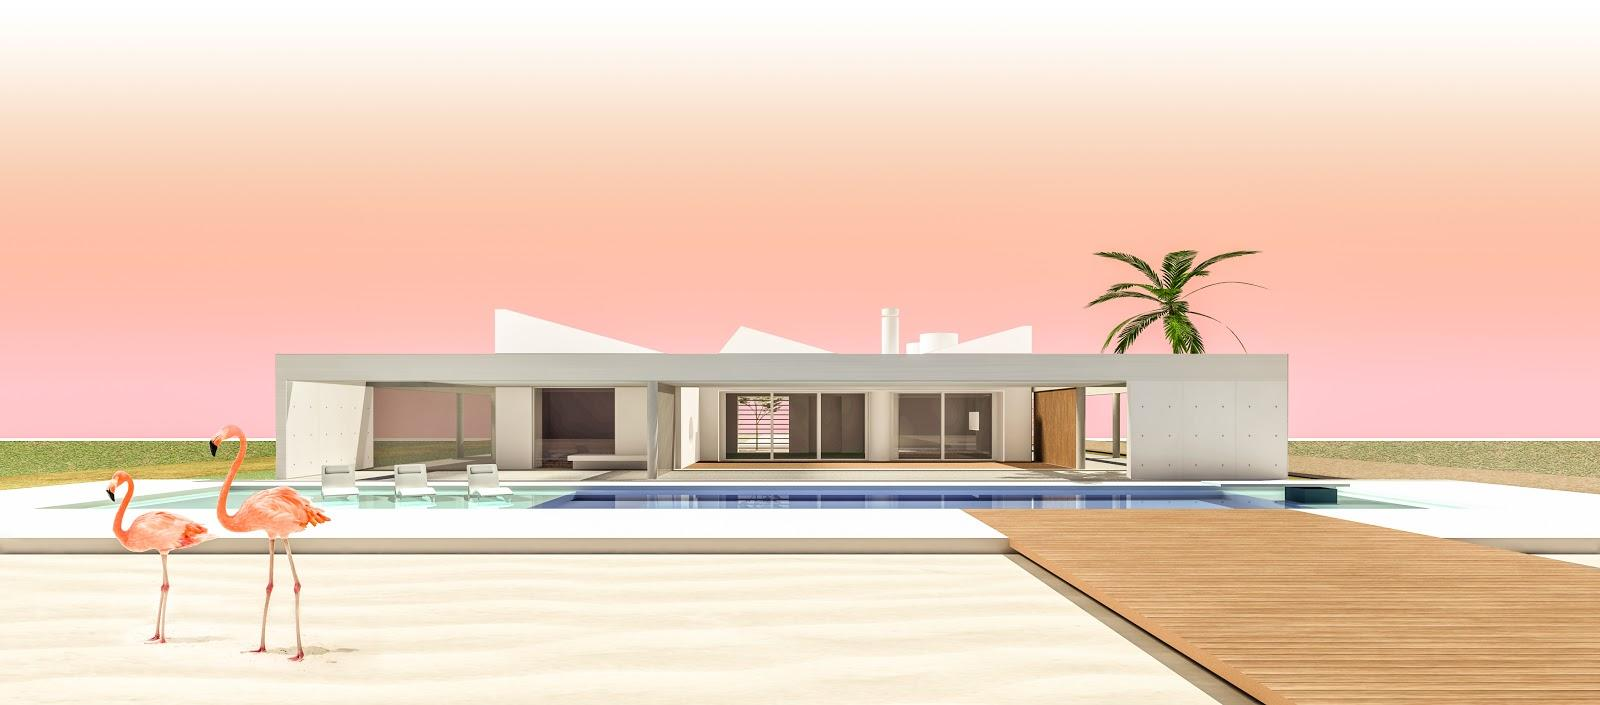 Neratza | Κατοικία στην Πελοπόνησο | RCTECH | Γιάννης Δουρίδας και Συνεργάτες - The Architect Show 2018